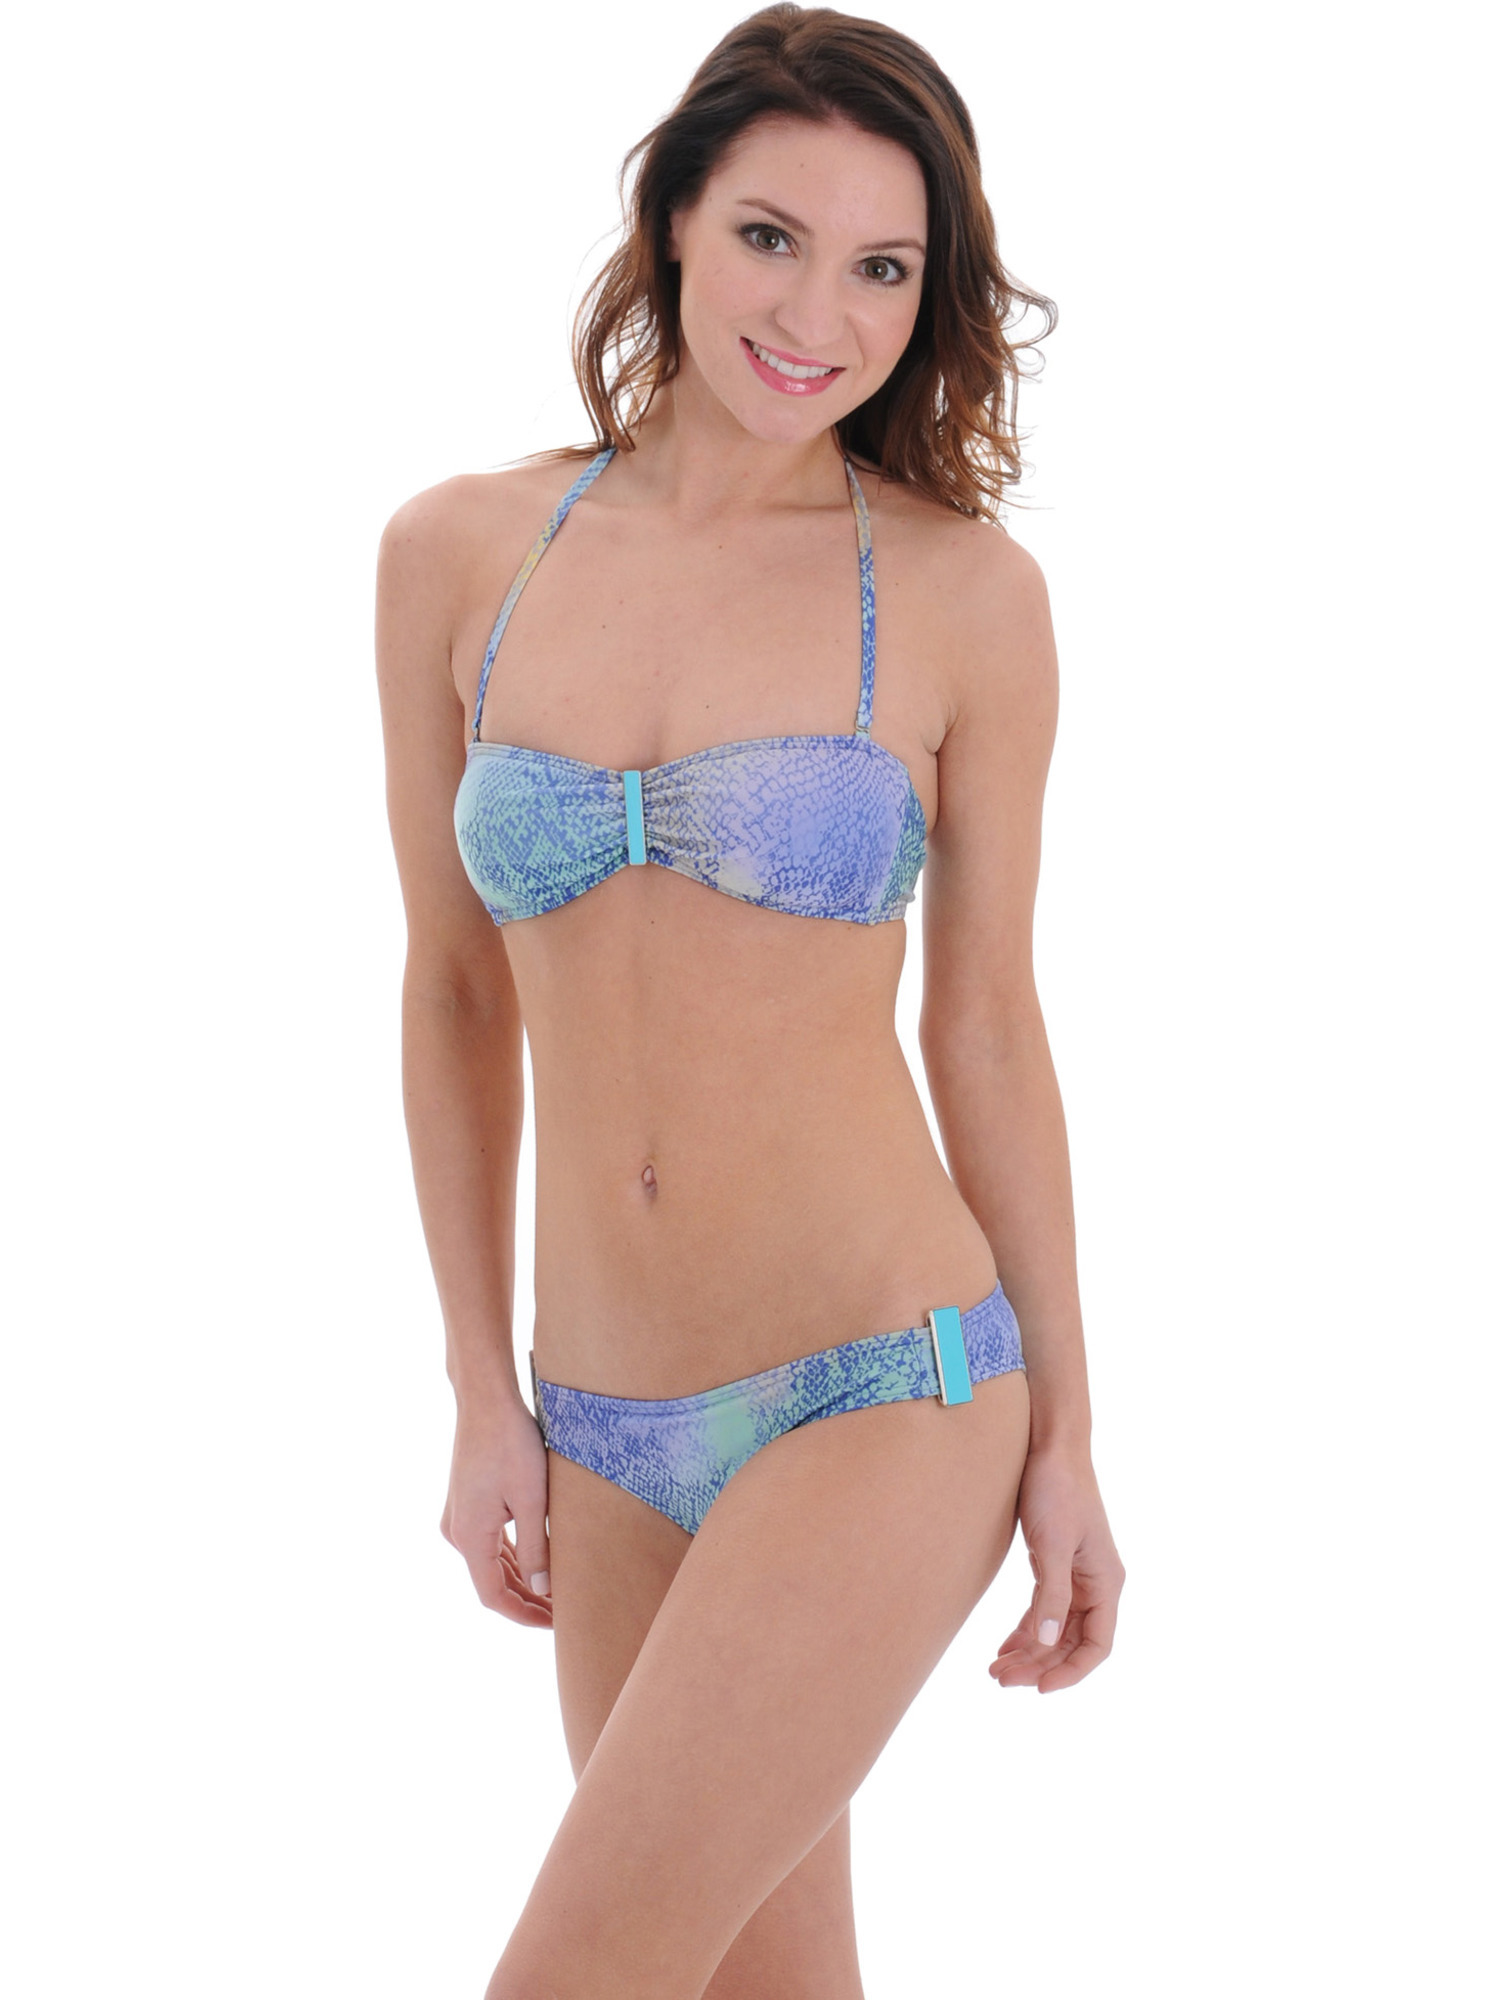 Raisins Junior Blue Halter Bandeau Swimsuit 2 Piece Bikini Set Cheeky Bottoms